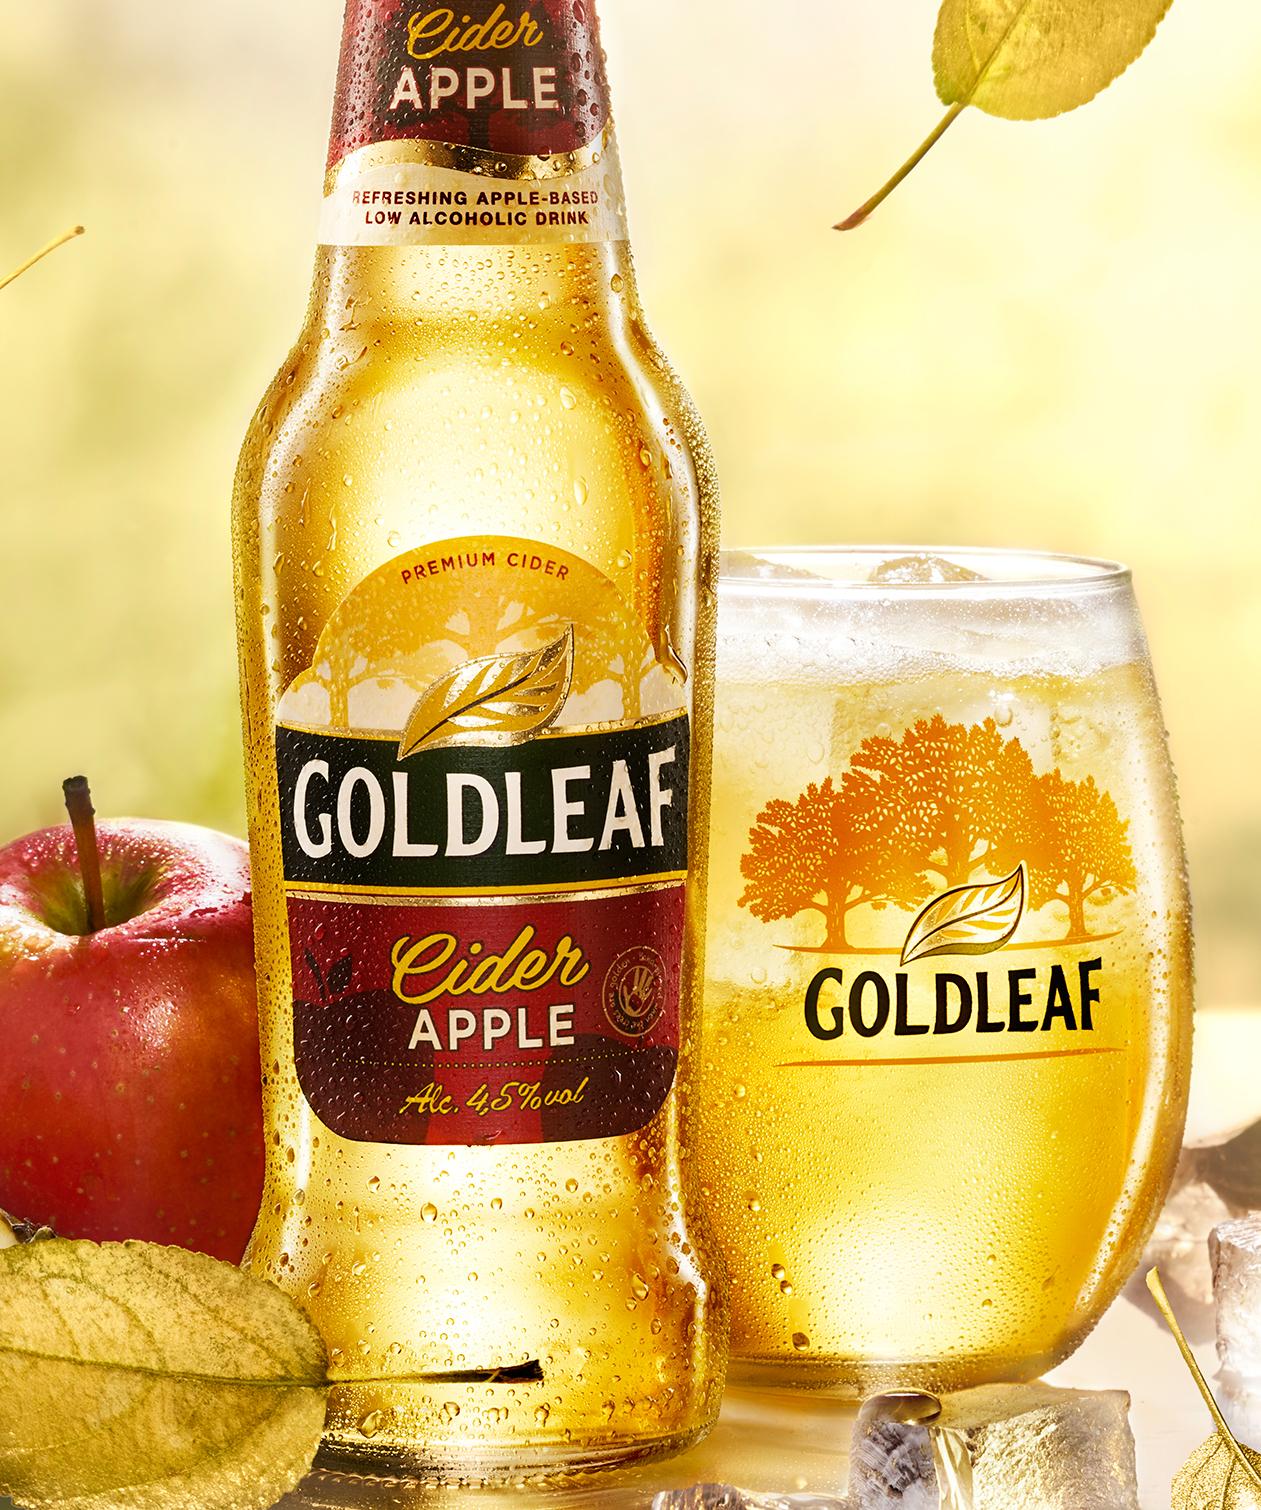 cider cold bottle ice apple beer leaf Photography  Post Production gold